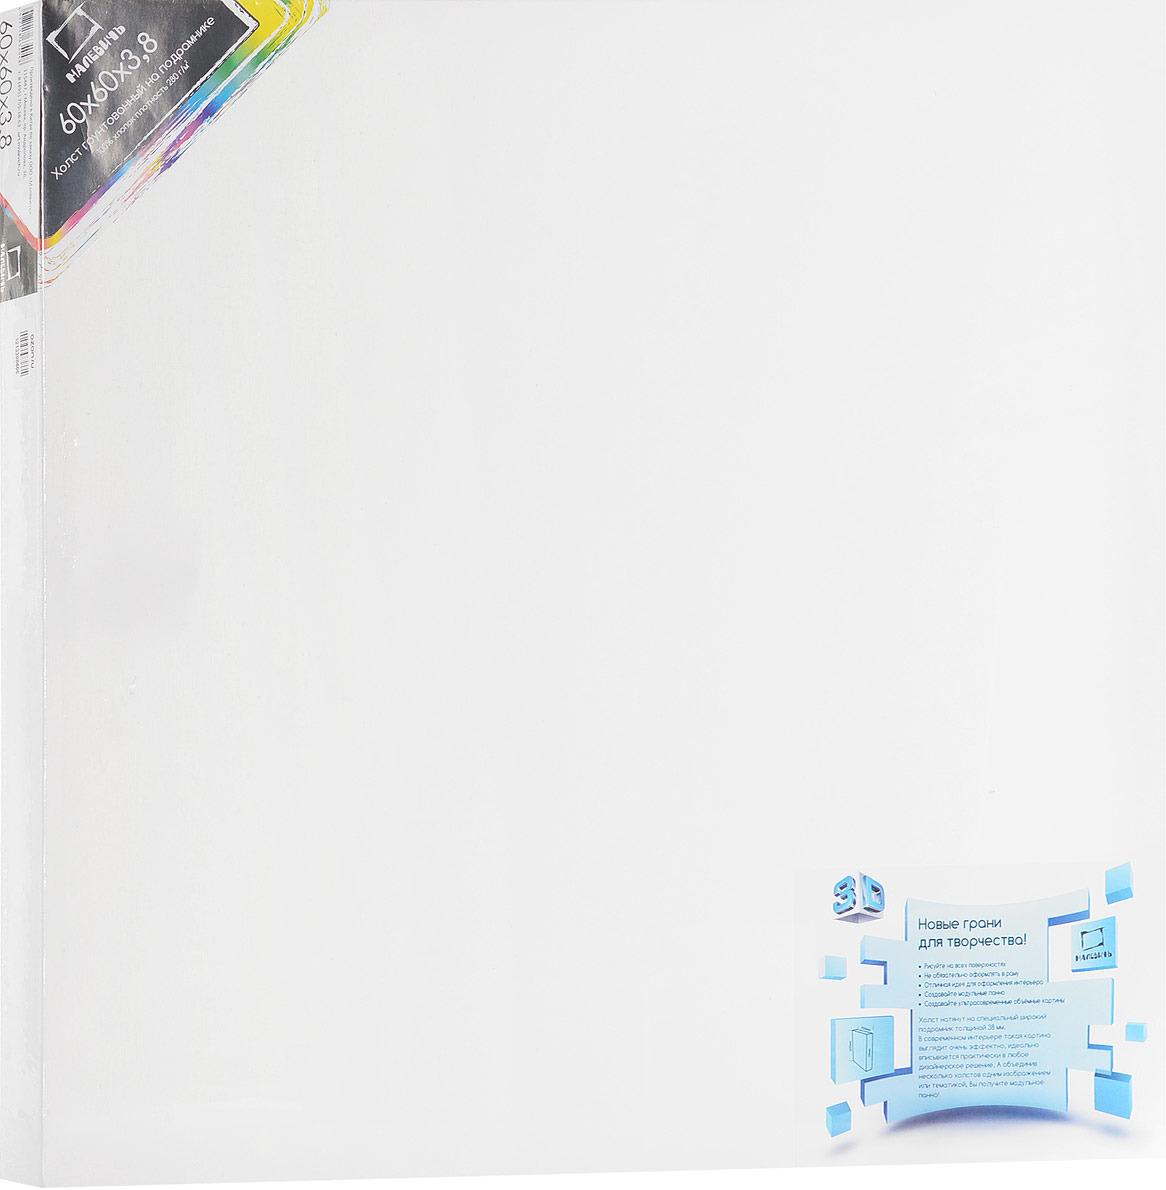 Малевичъ Холст на подрамнике 3D 60 х 60 х 3,8 см 280 г/м2